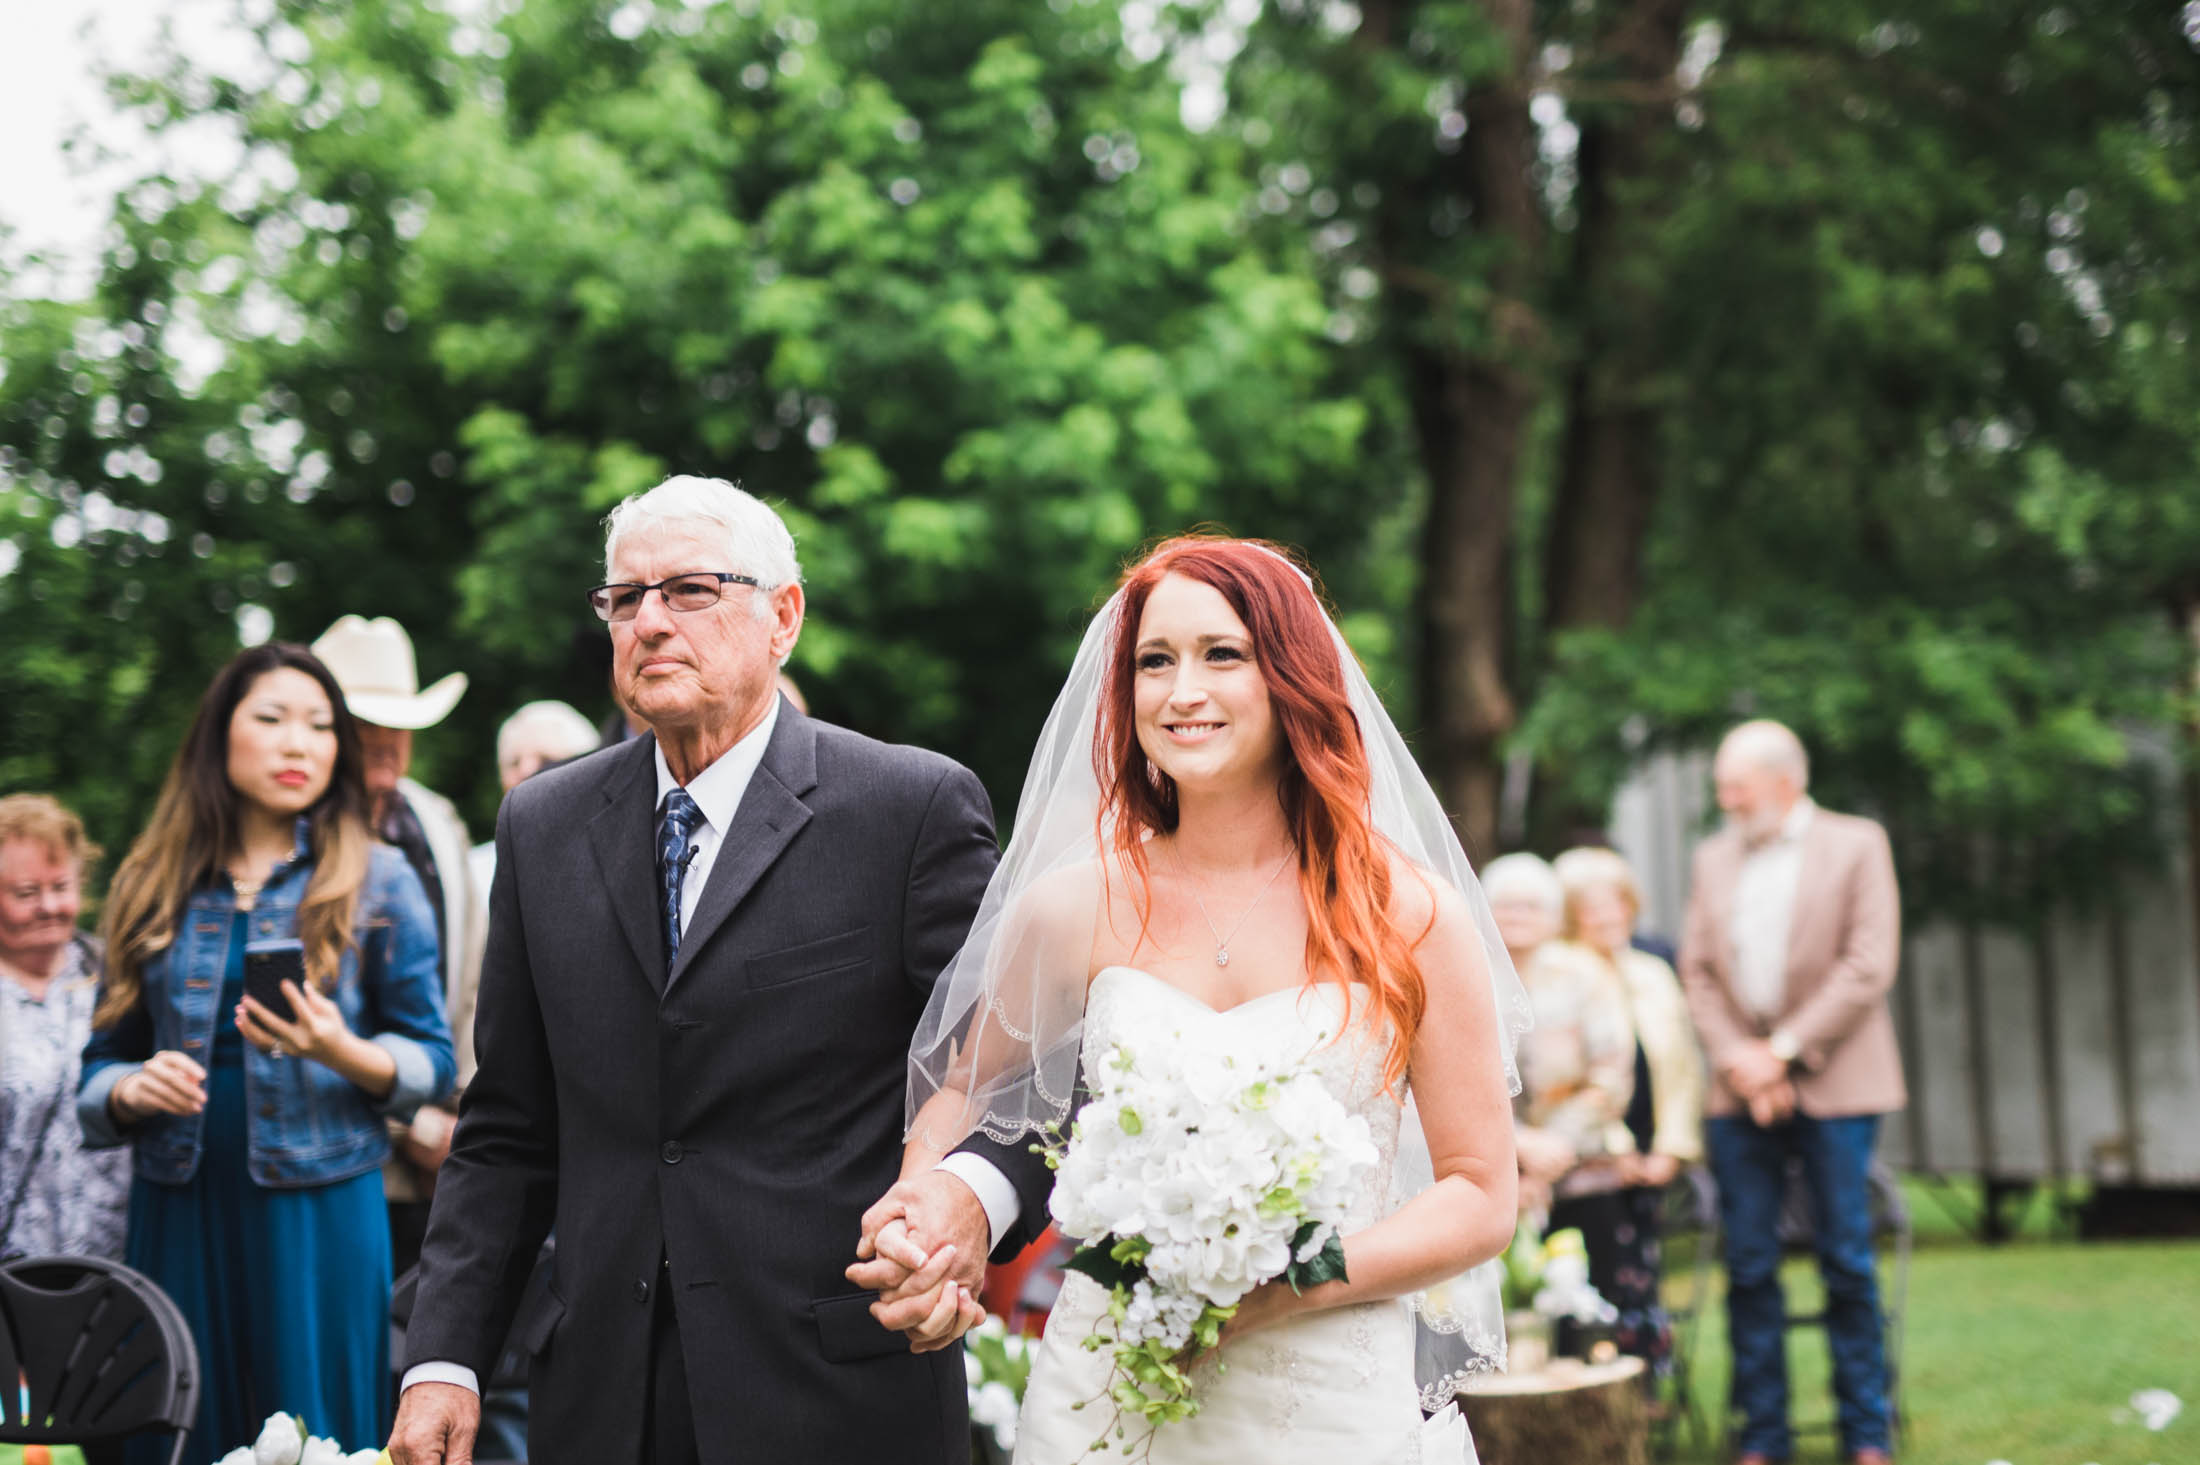 Lexi Hoebing Photography | Mustang, Oklahoma Wedding Photographer